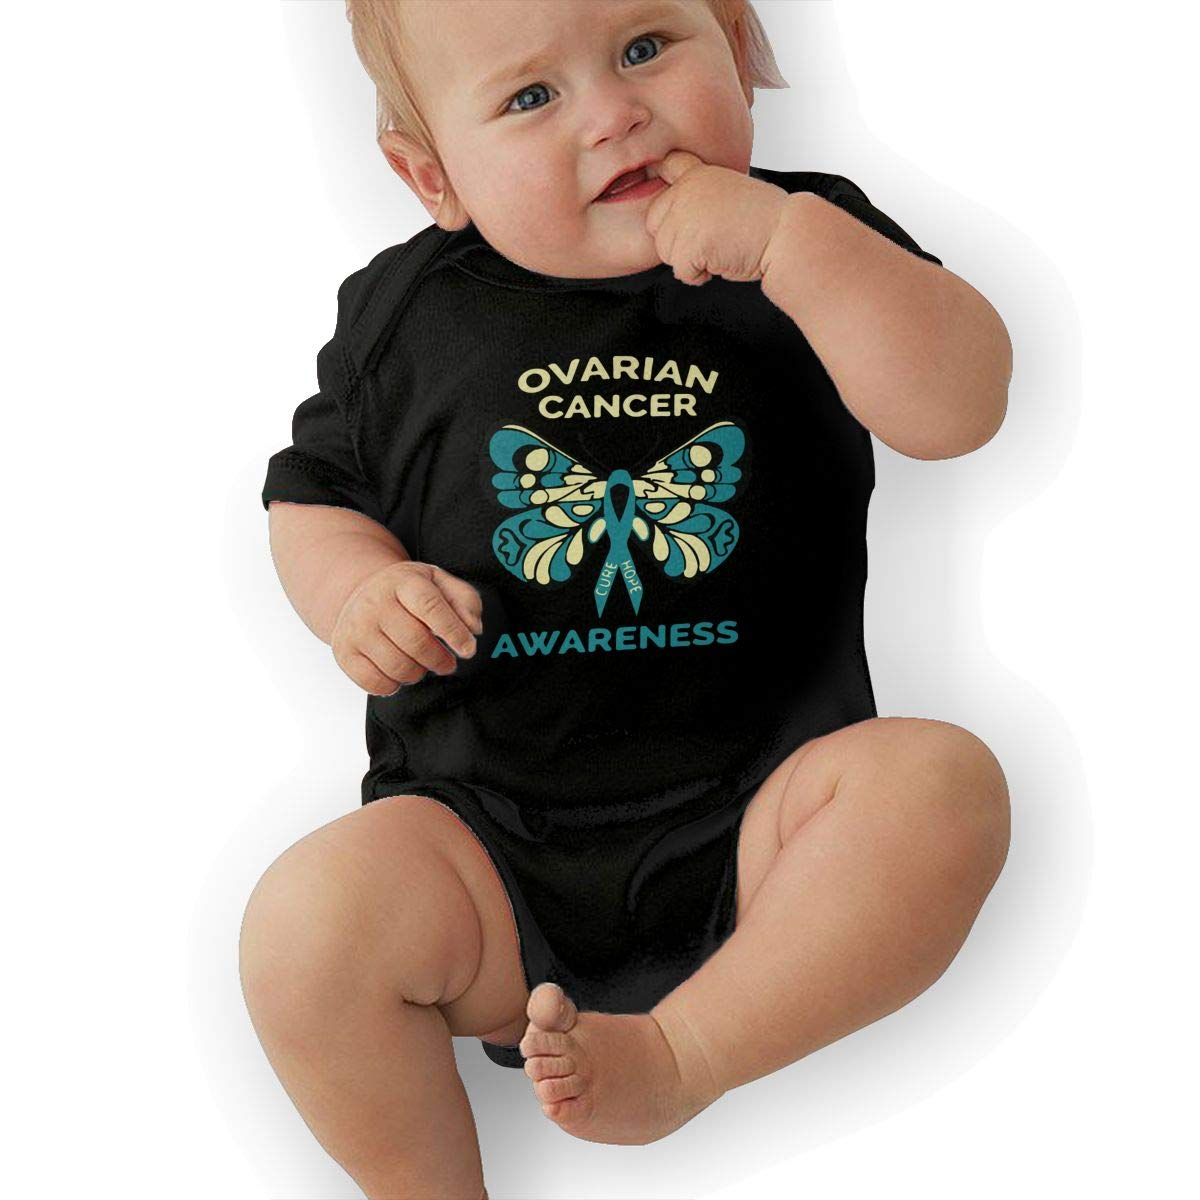 Cute Ovarian Cancer Awareness Playsuit U88oi-8 Short Sleeve Cotton Bodysuit for Unisex Baby